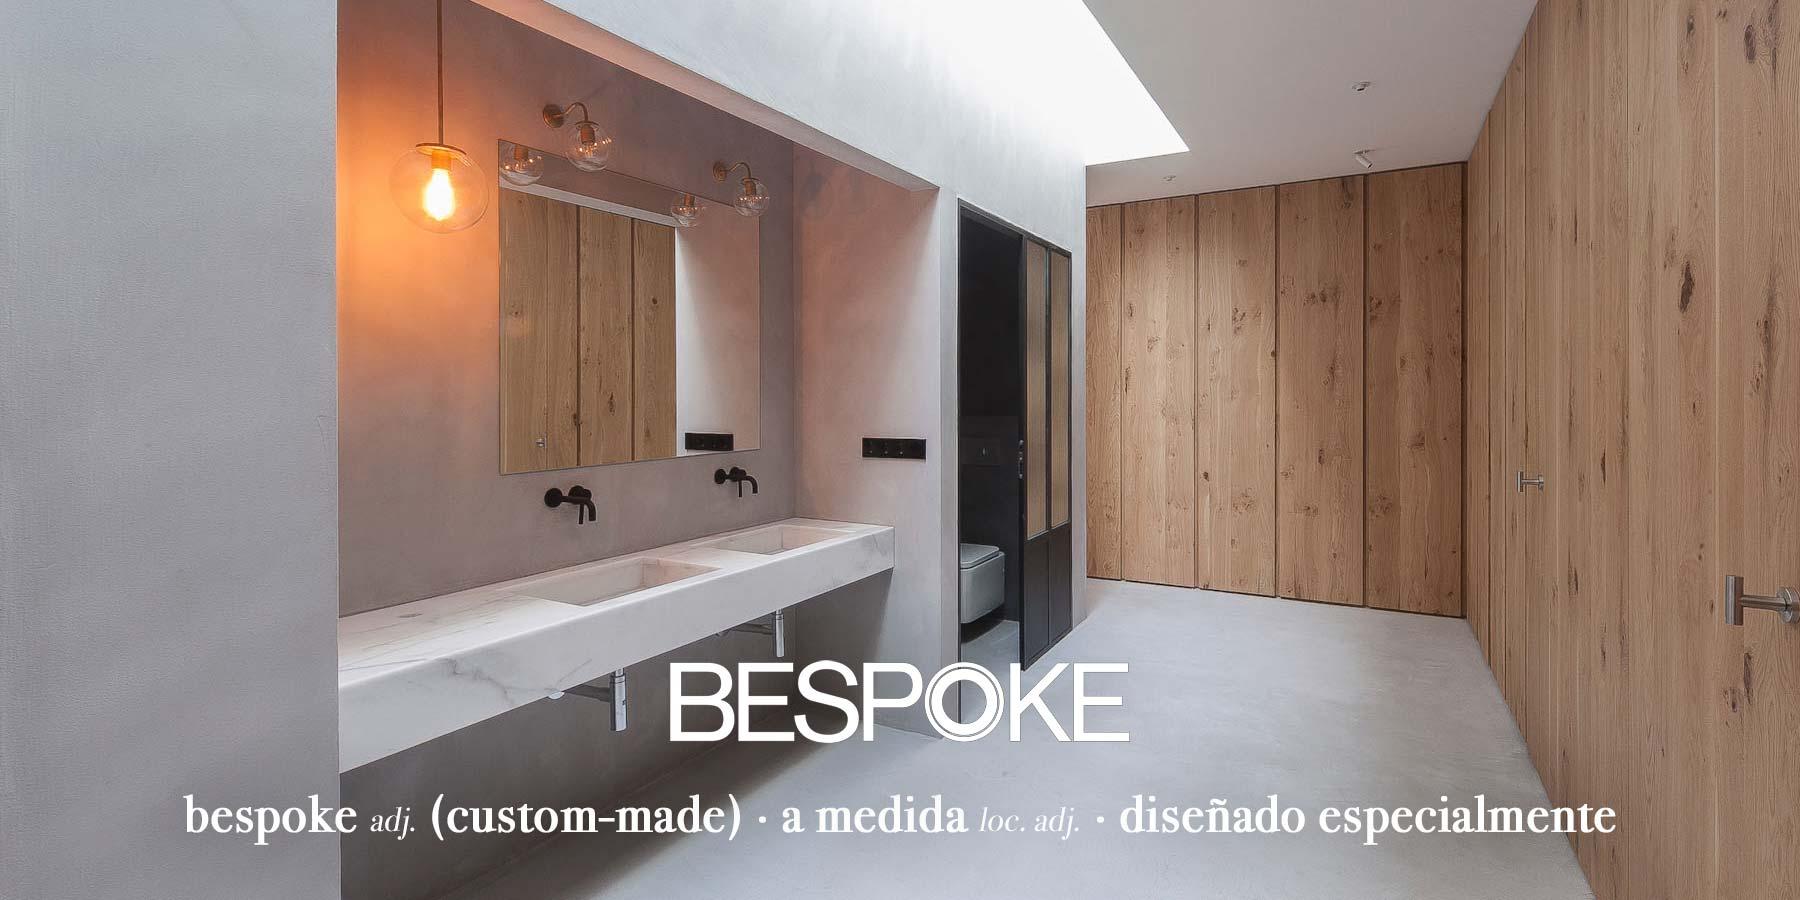 HOME_BESPOKE_CASA PATIO_04